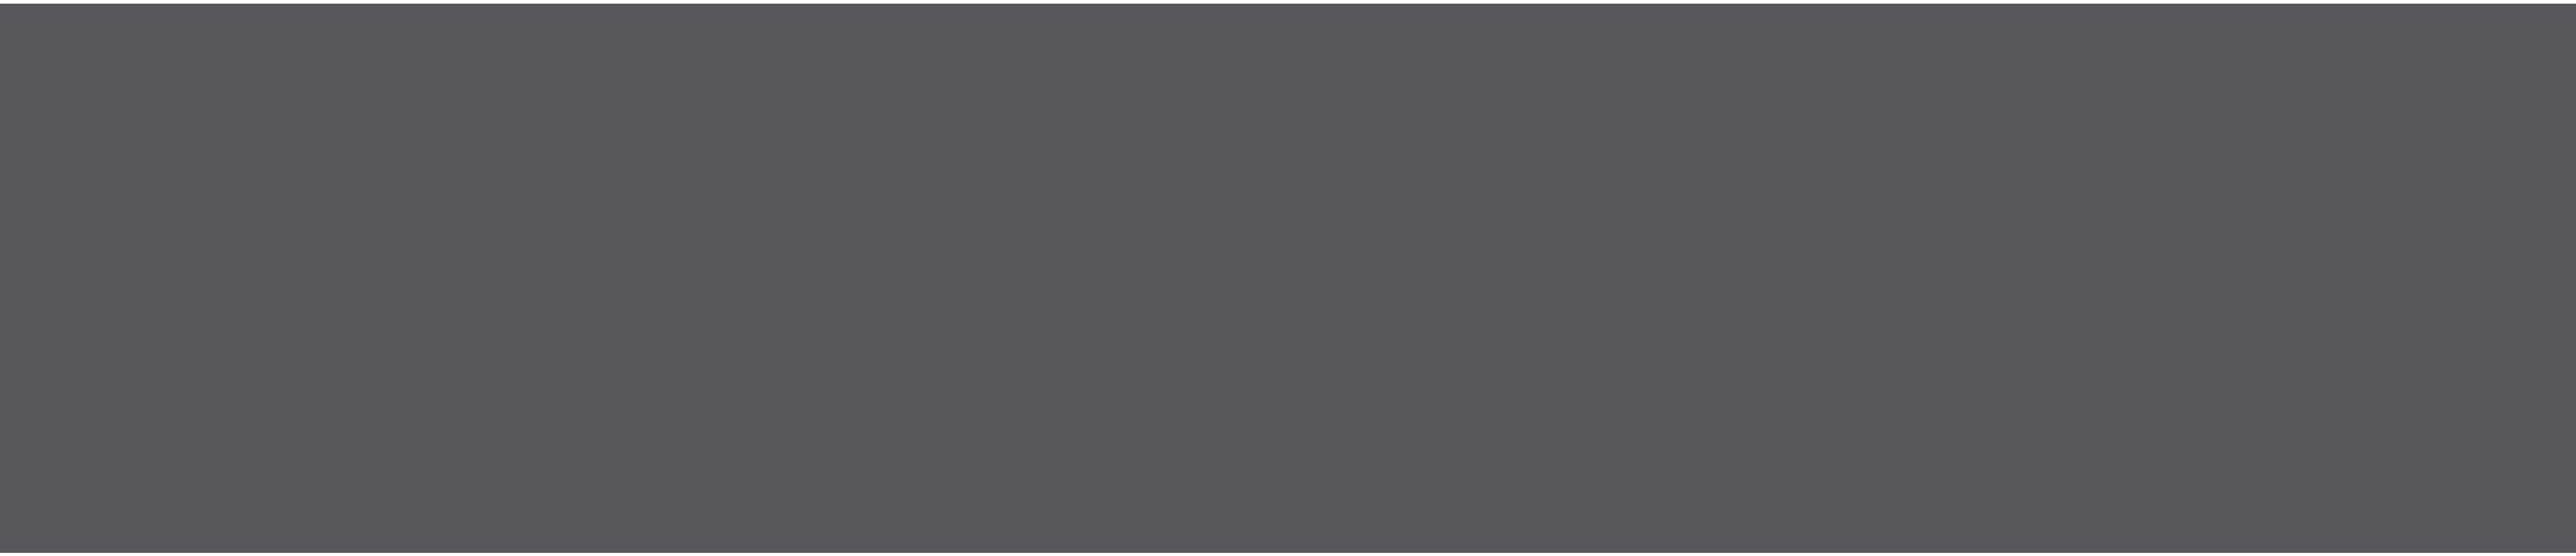 Konzolkirály - Aszucar parner